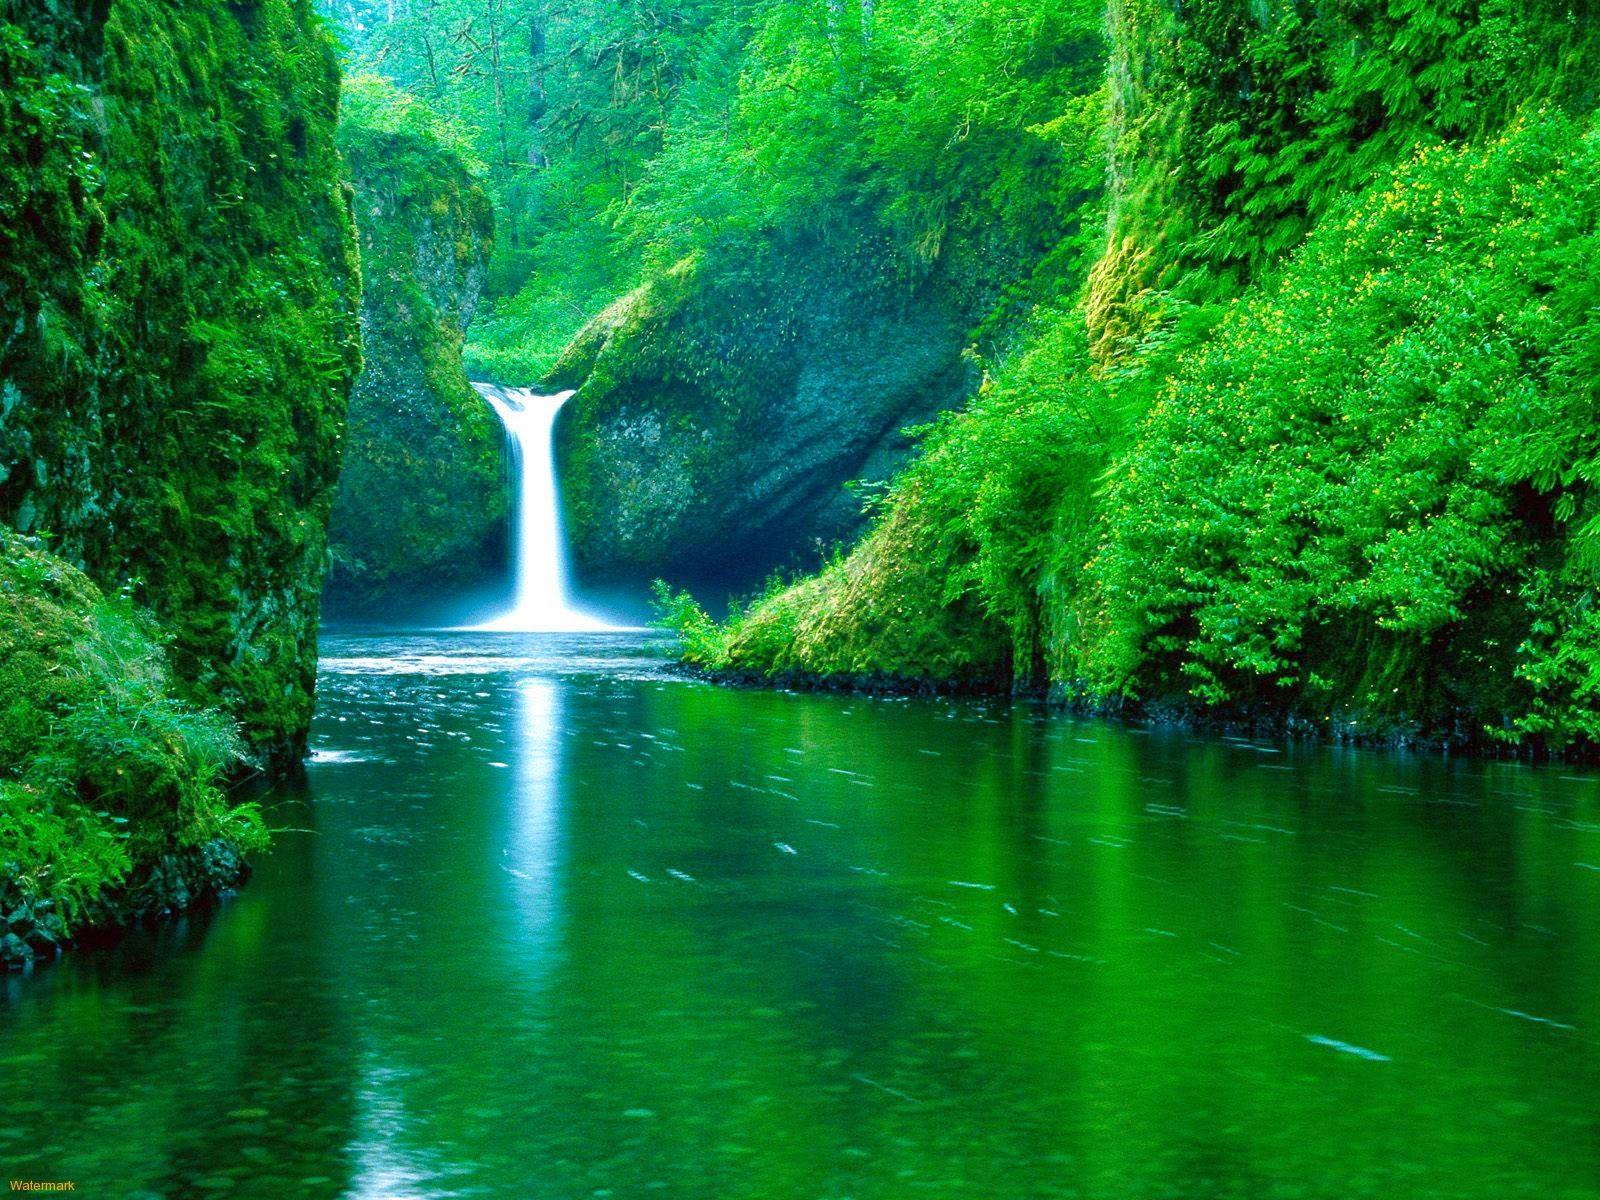 Gambar Air Terjun Tercantik di Dunia Wallaper Pemandangan Alam Indah